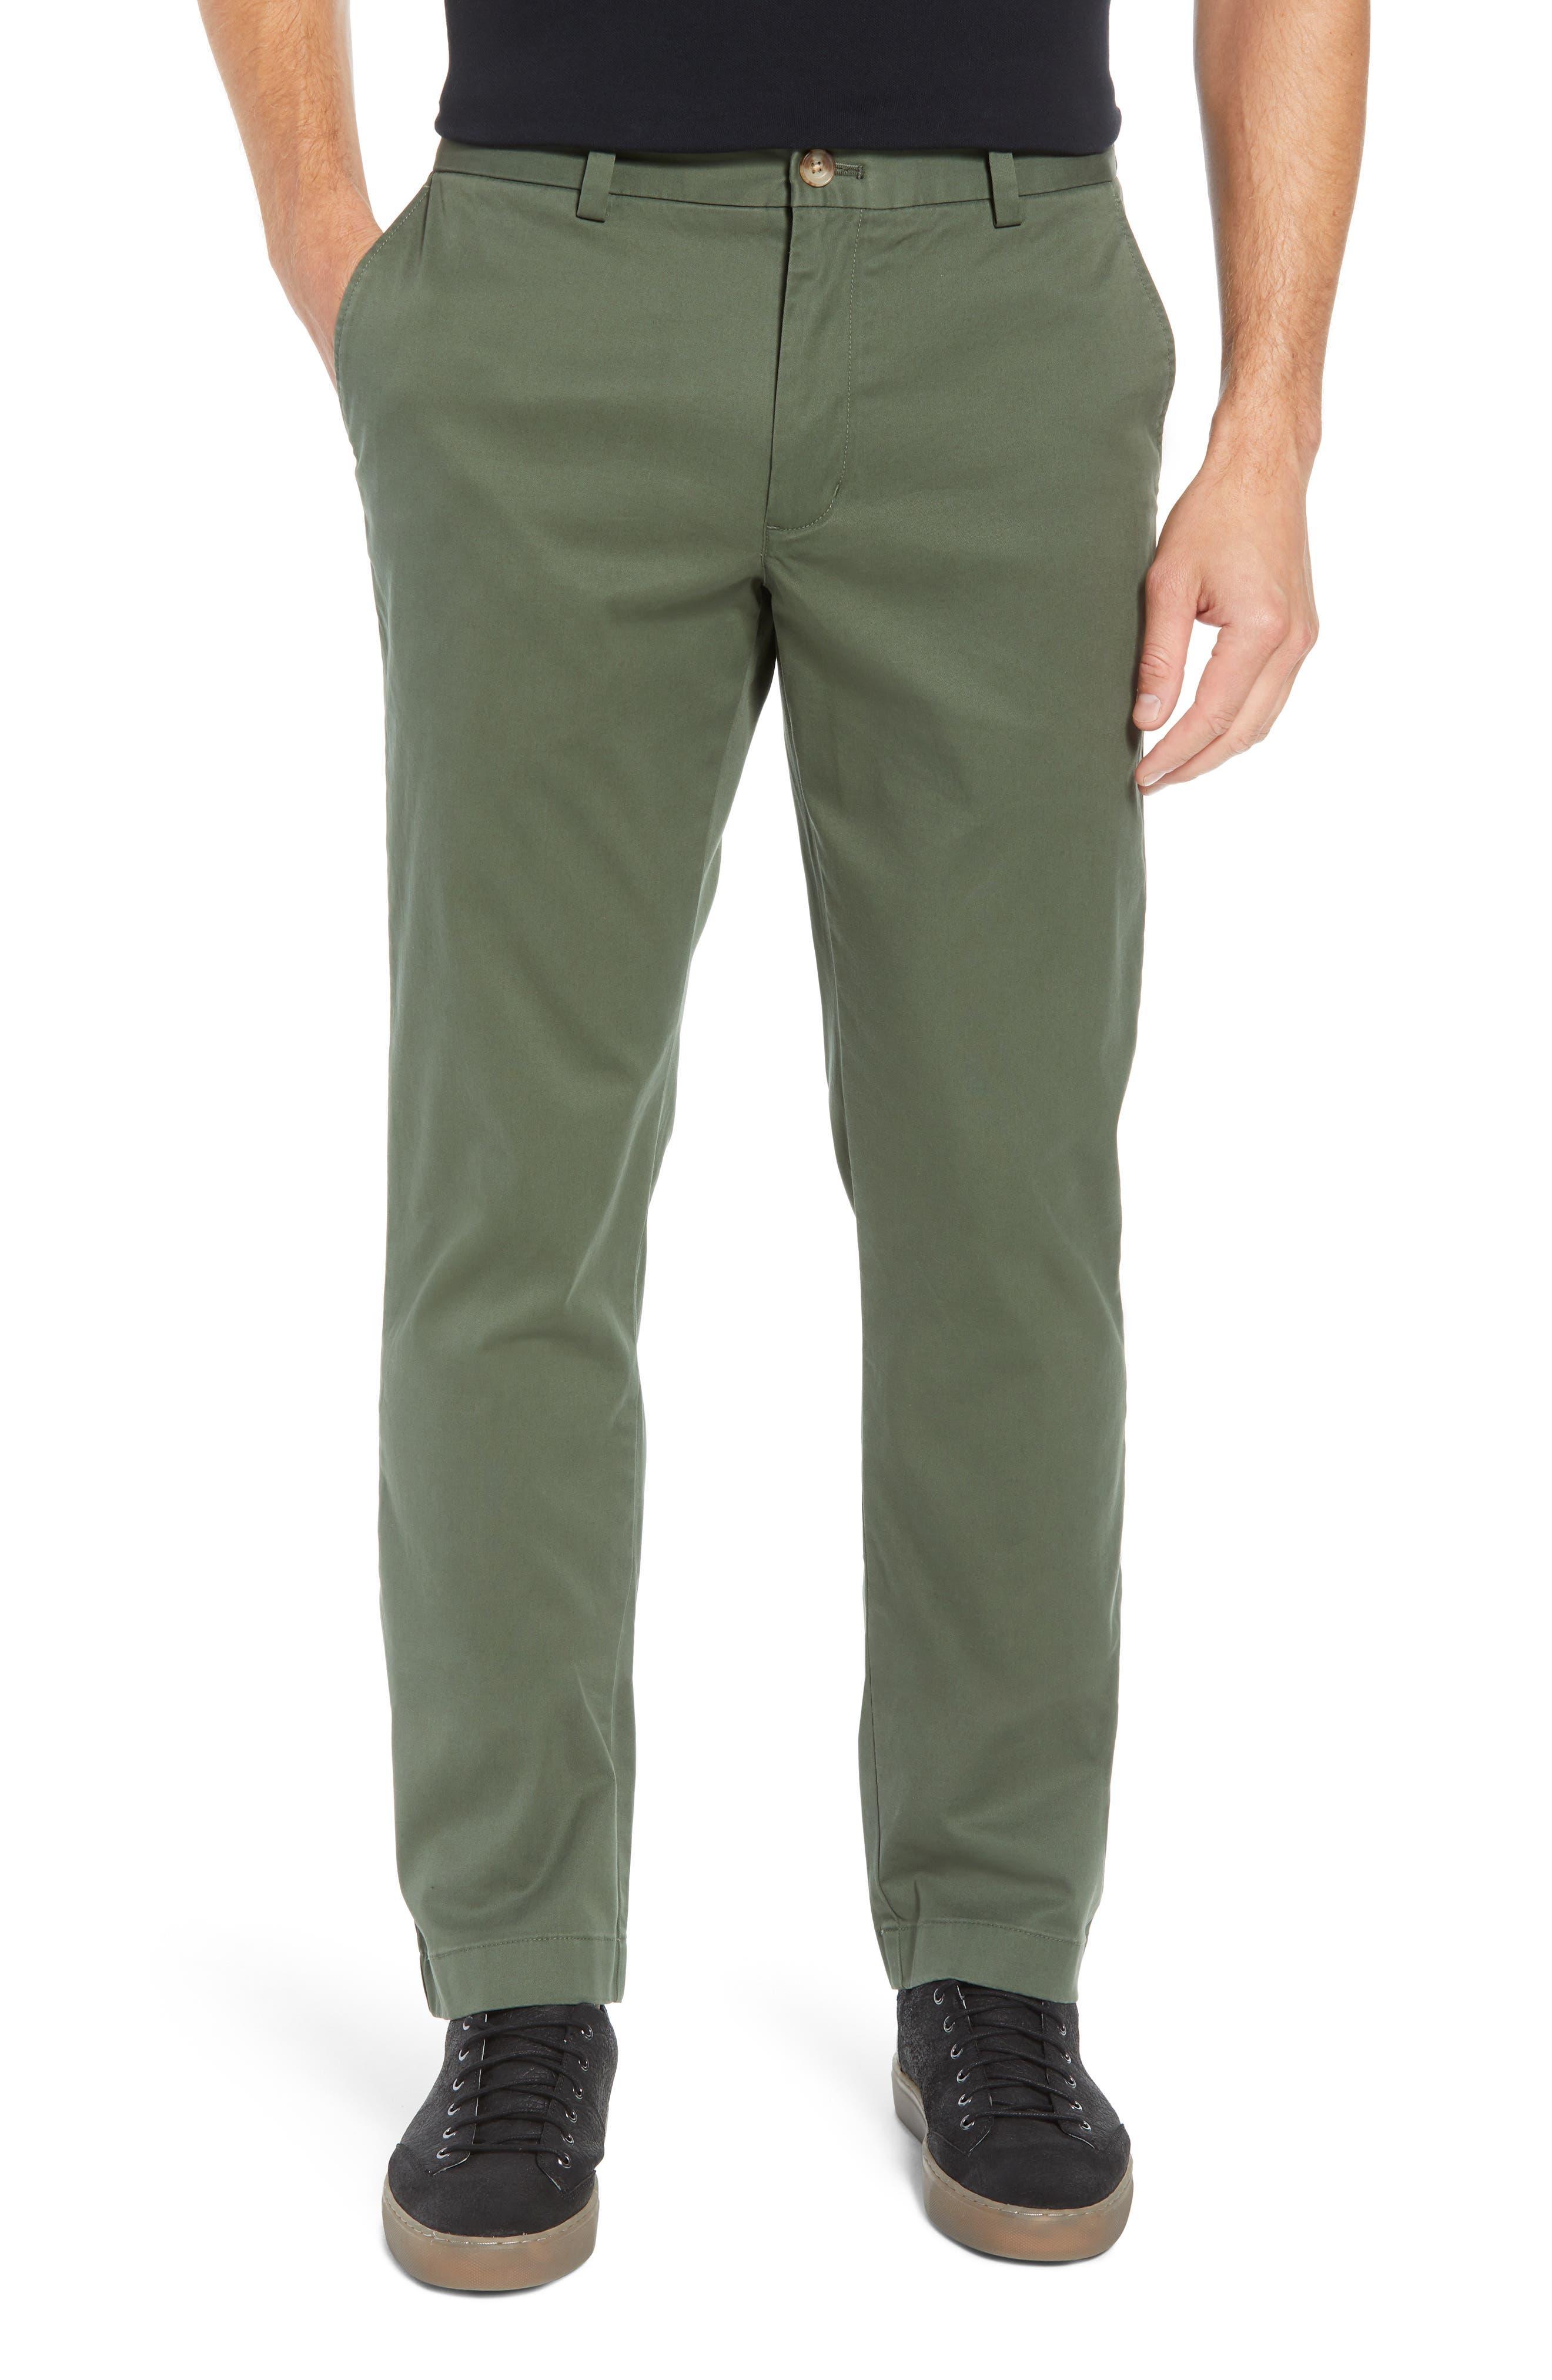 VINEYARD VINES Breaker Flat Front Stretch Cotton Pants, Main, color, CARGO GREEN